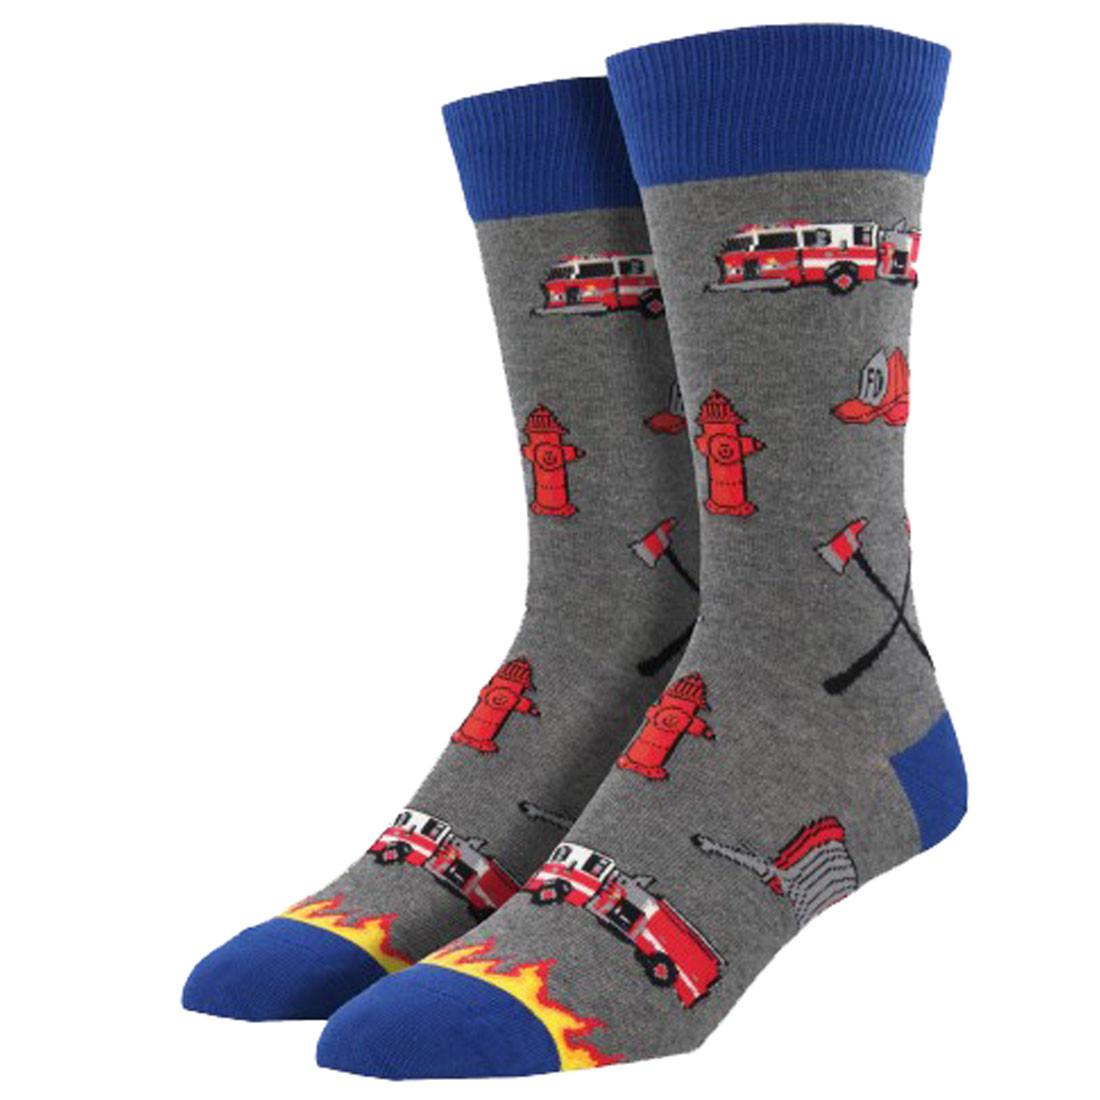 Men's Crew Socks Fire Fighter Navy Gray